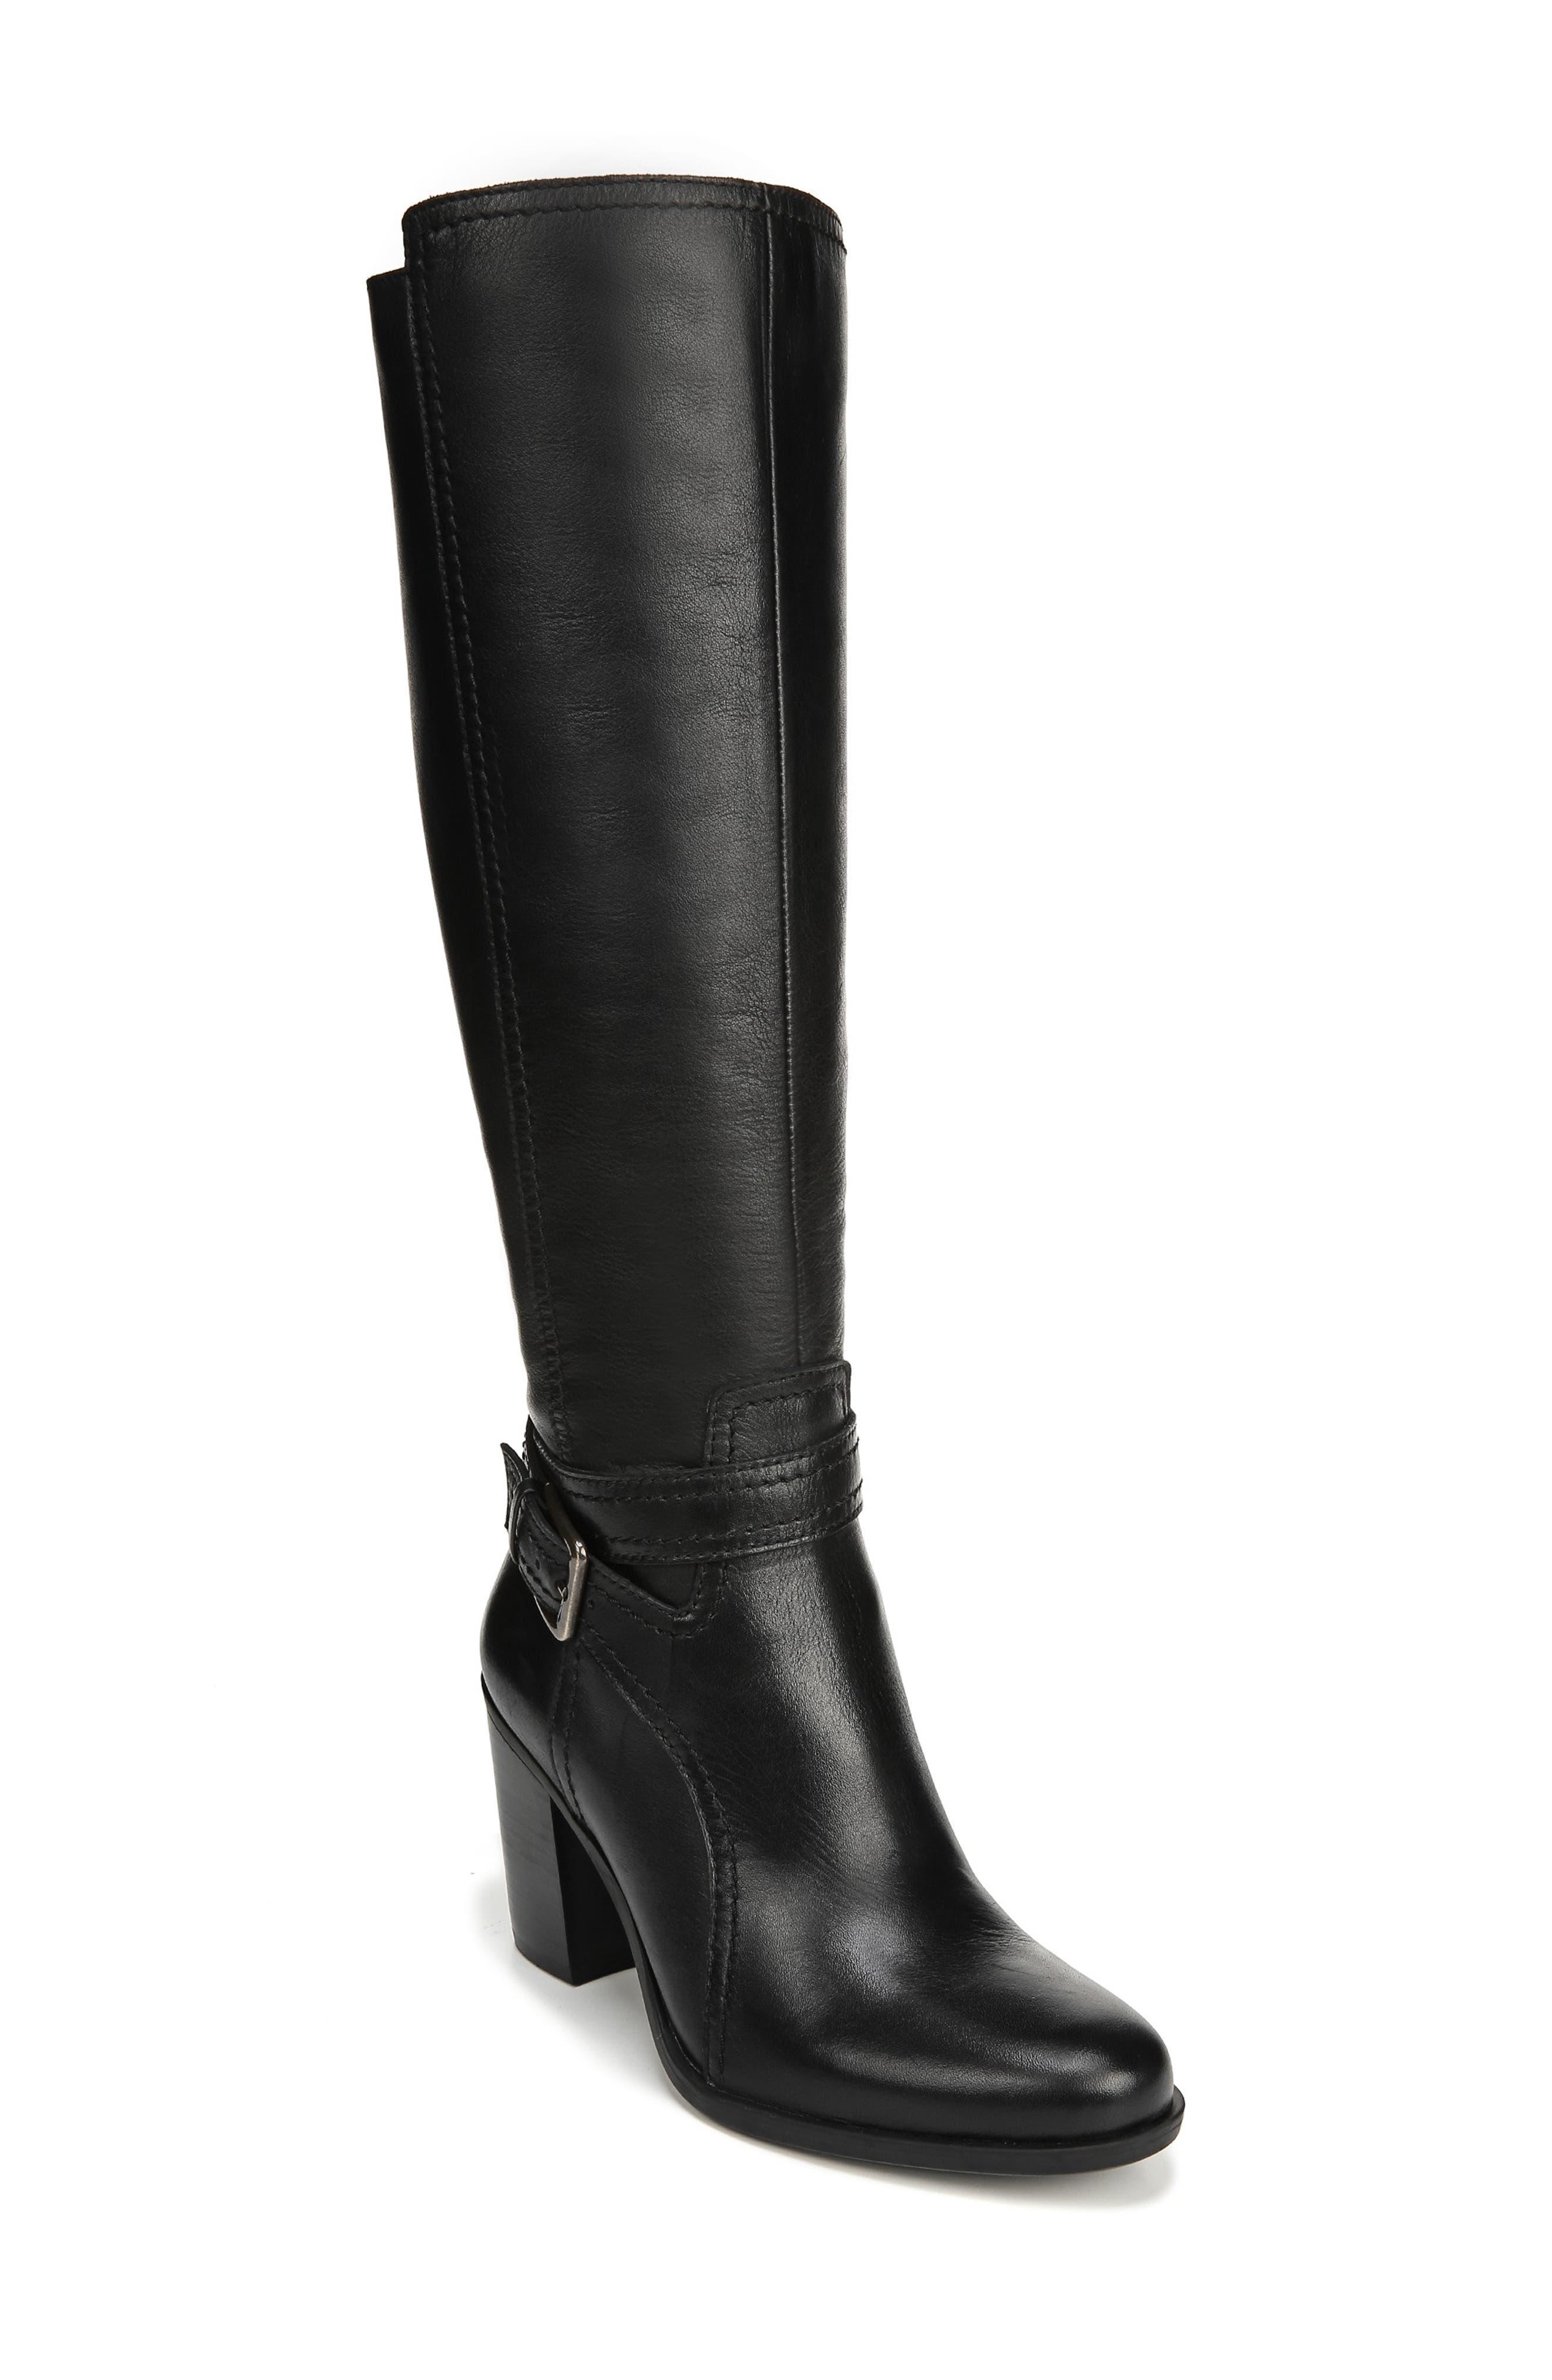 Naturalizer Kelsey Knee High Boot, Wide Calf- Black